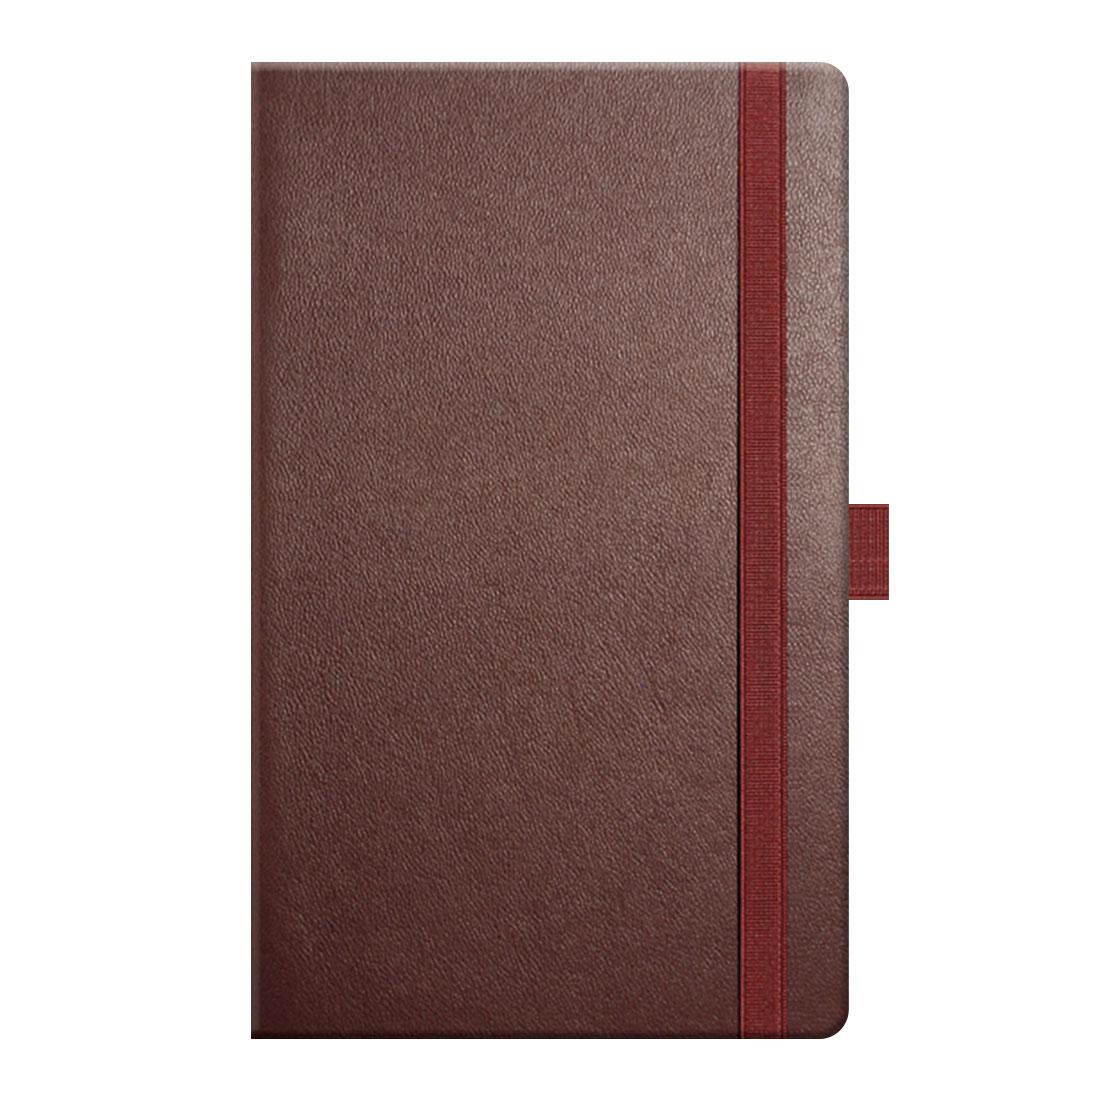 Castelli  Notebooks  Castelli Nappa Genuine Leather